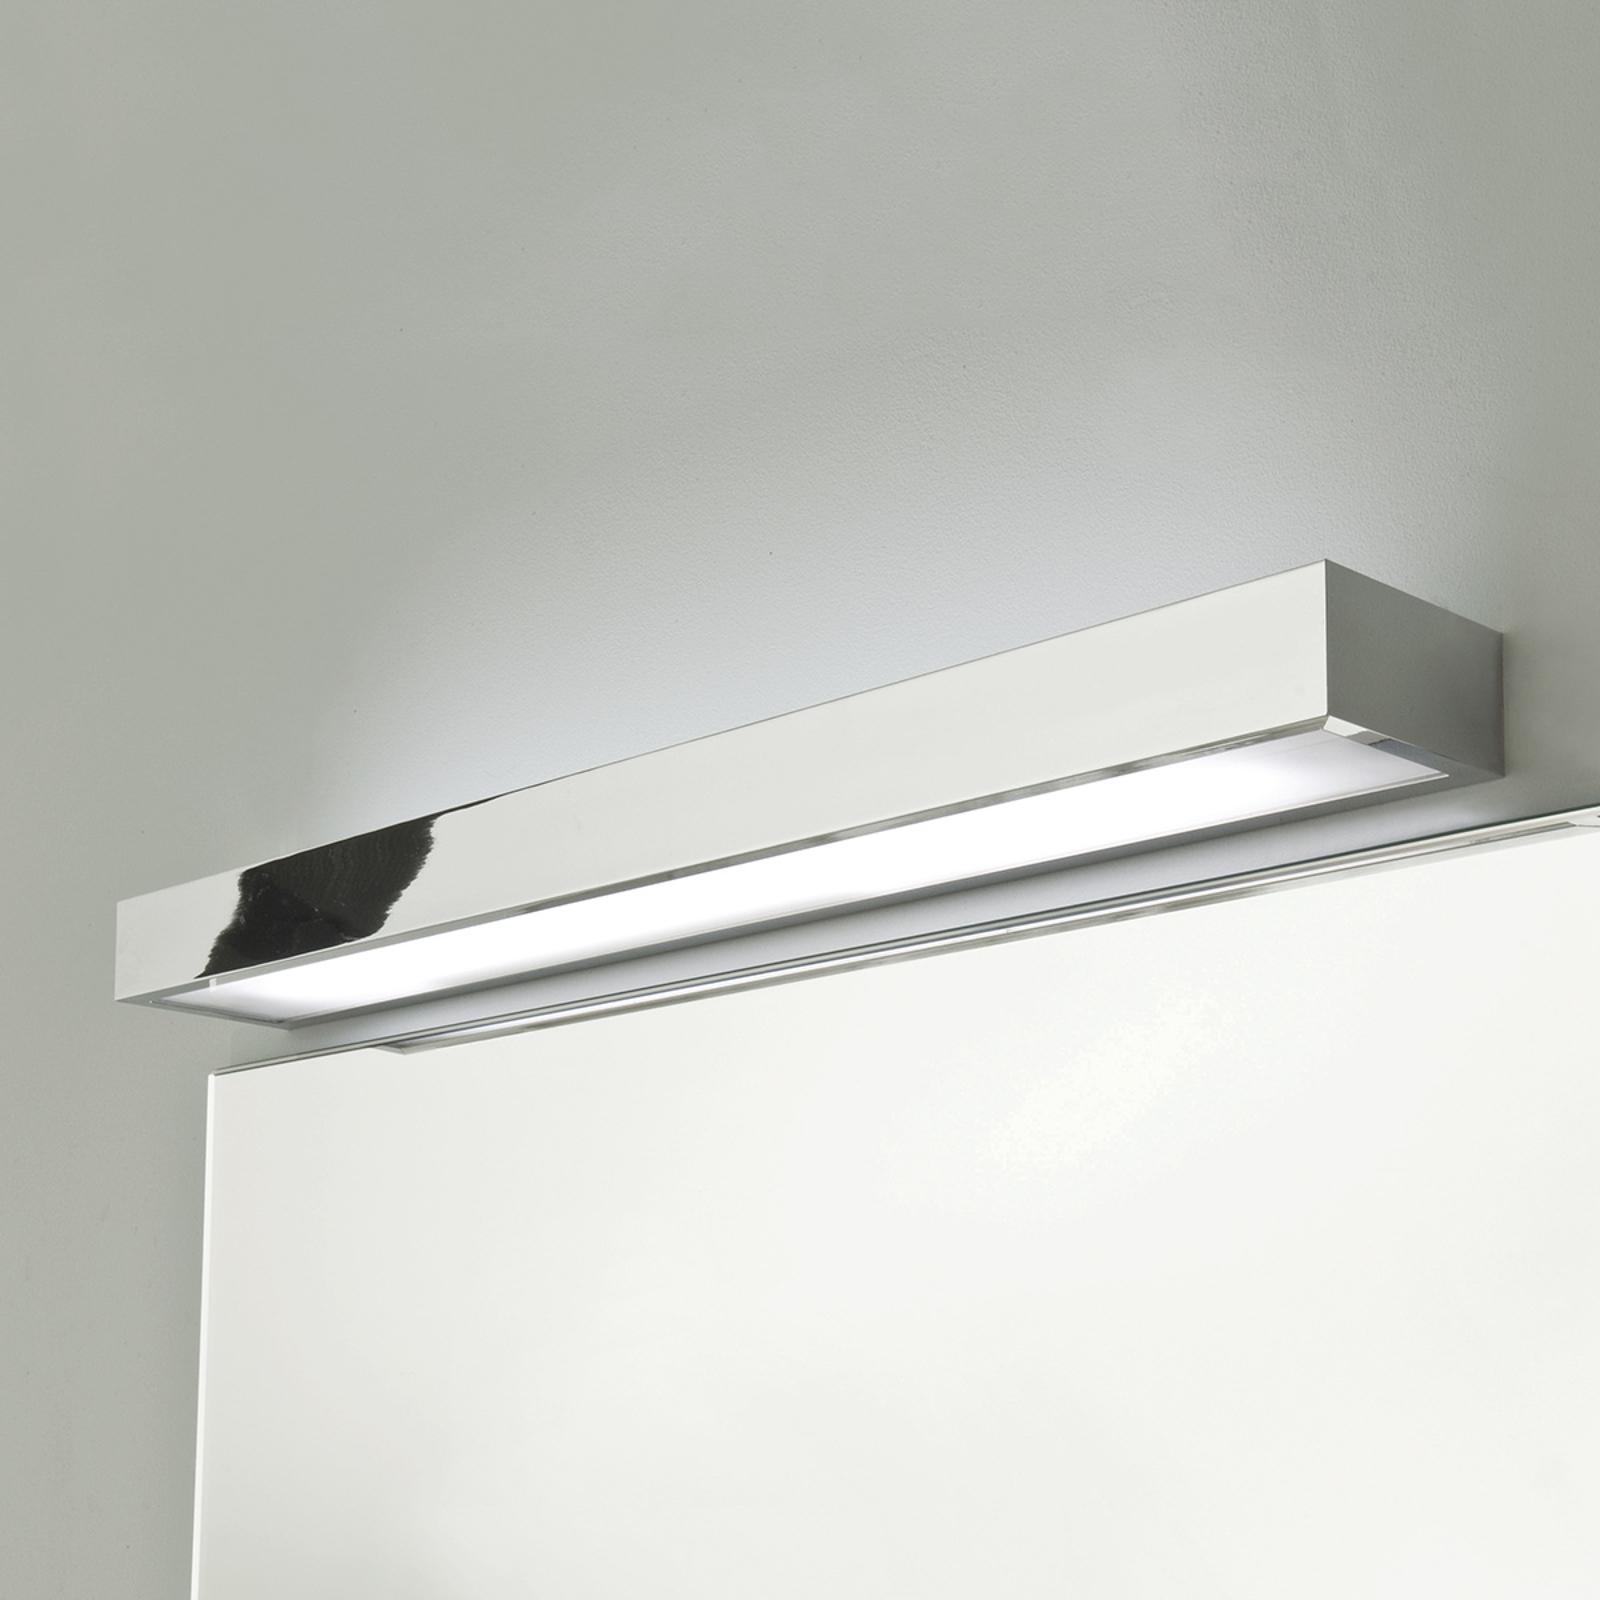 Chroom-glanzende wandlamp TALLIN, lengte 60 cm